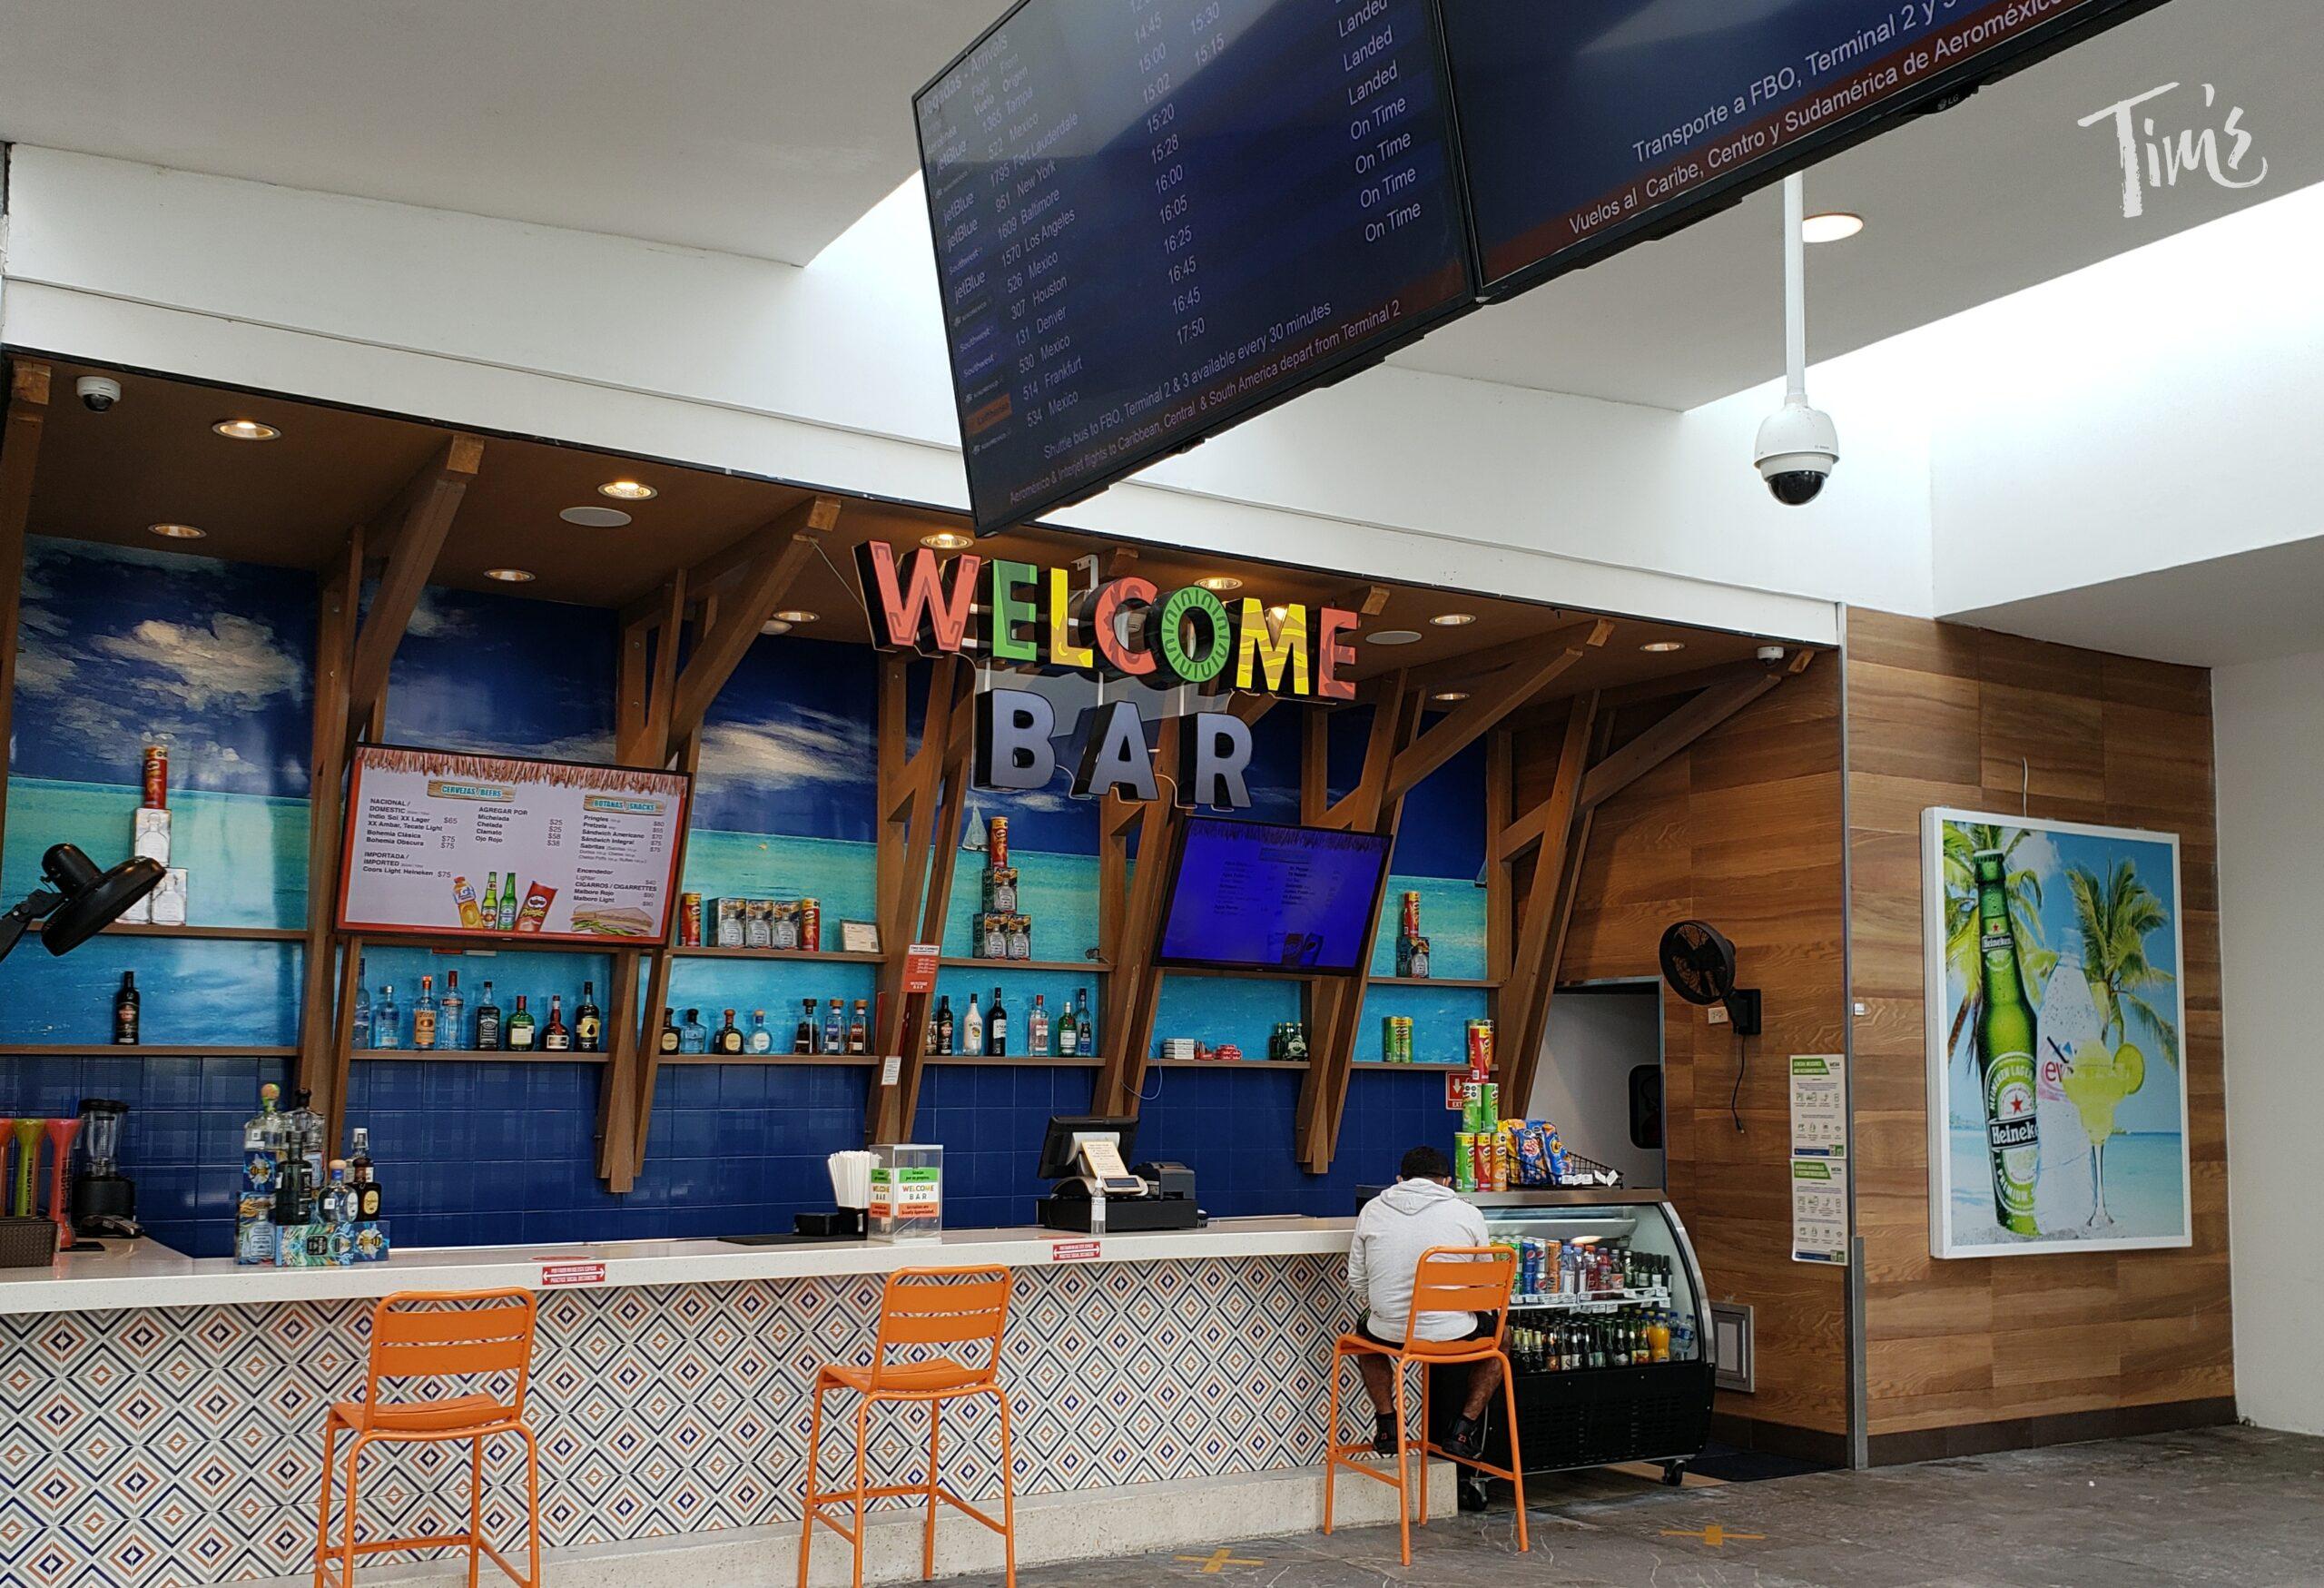 Welcome Bar in Cancun Mexico Terminal 4